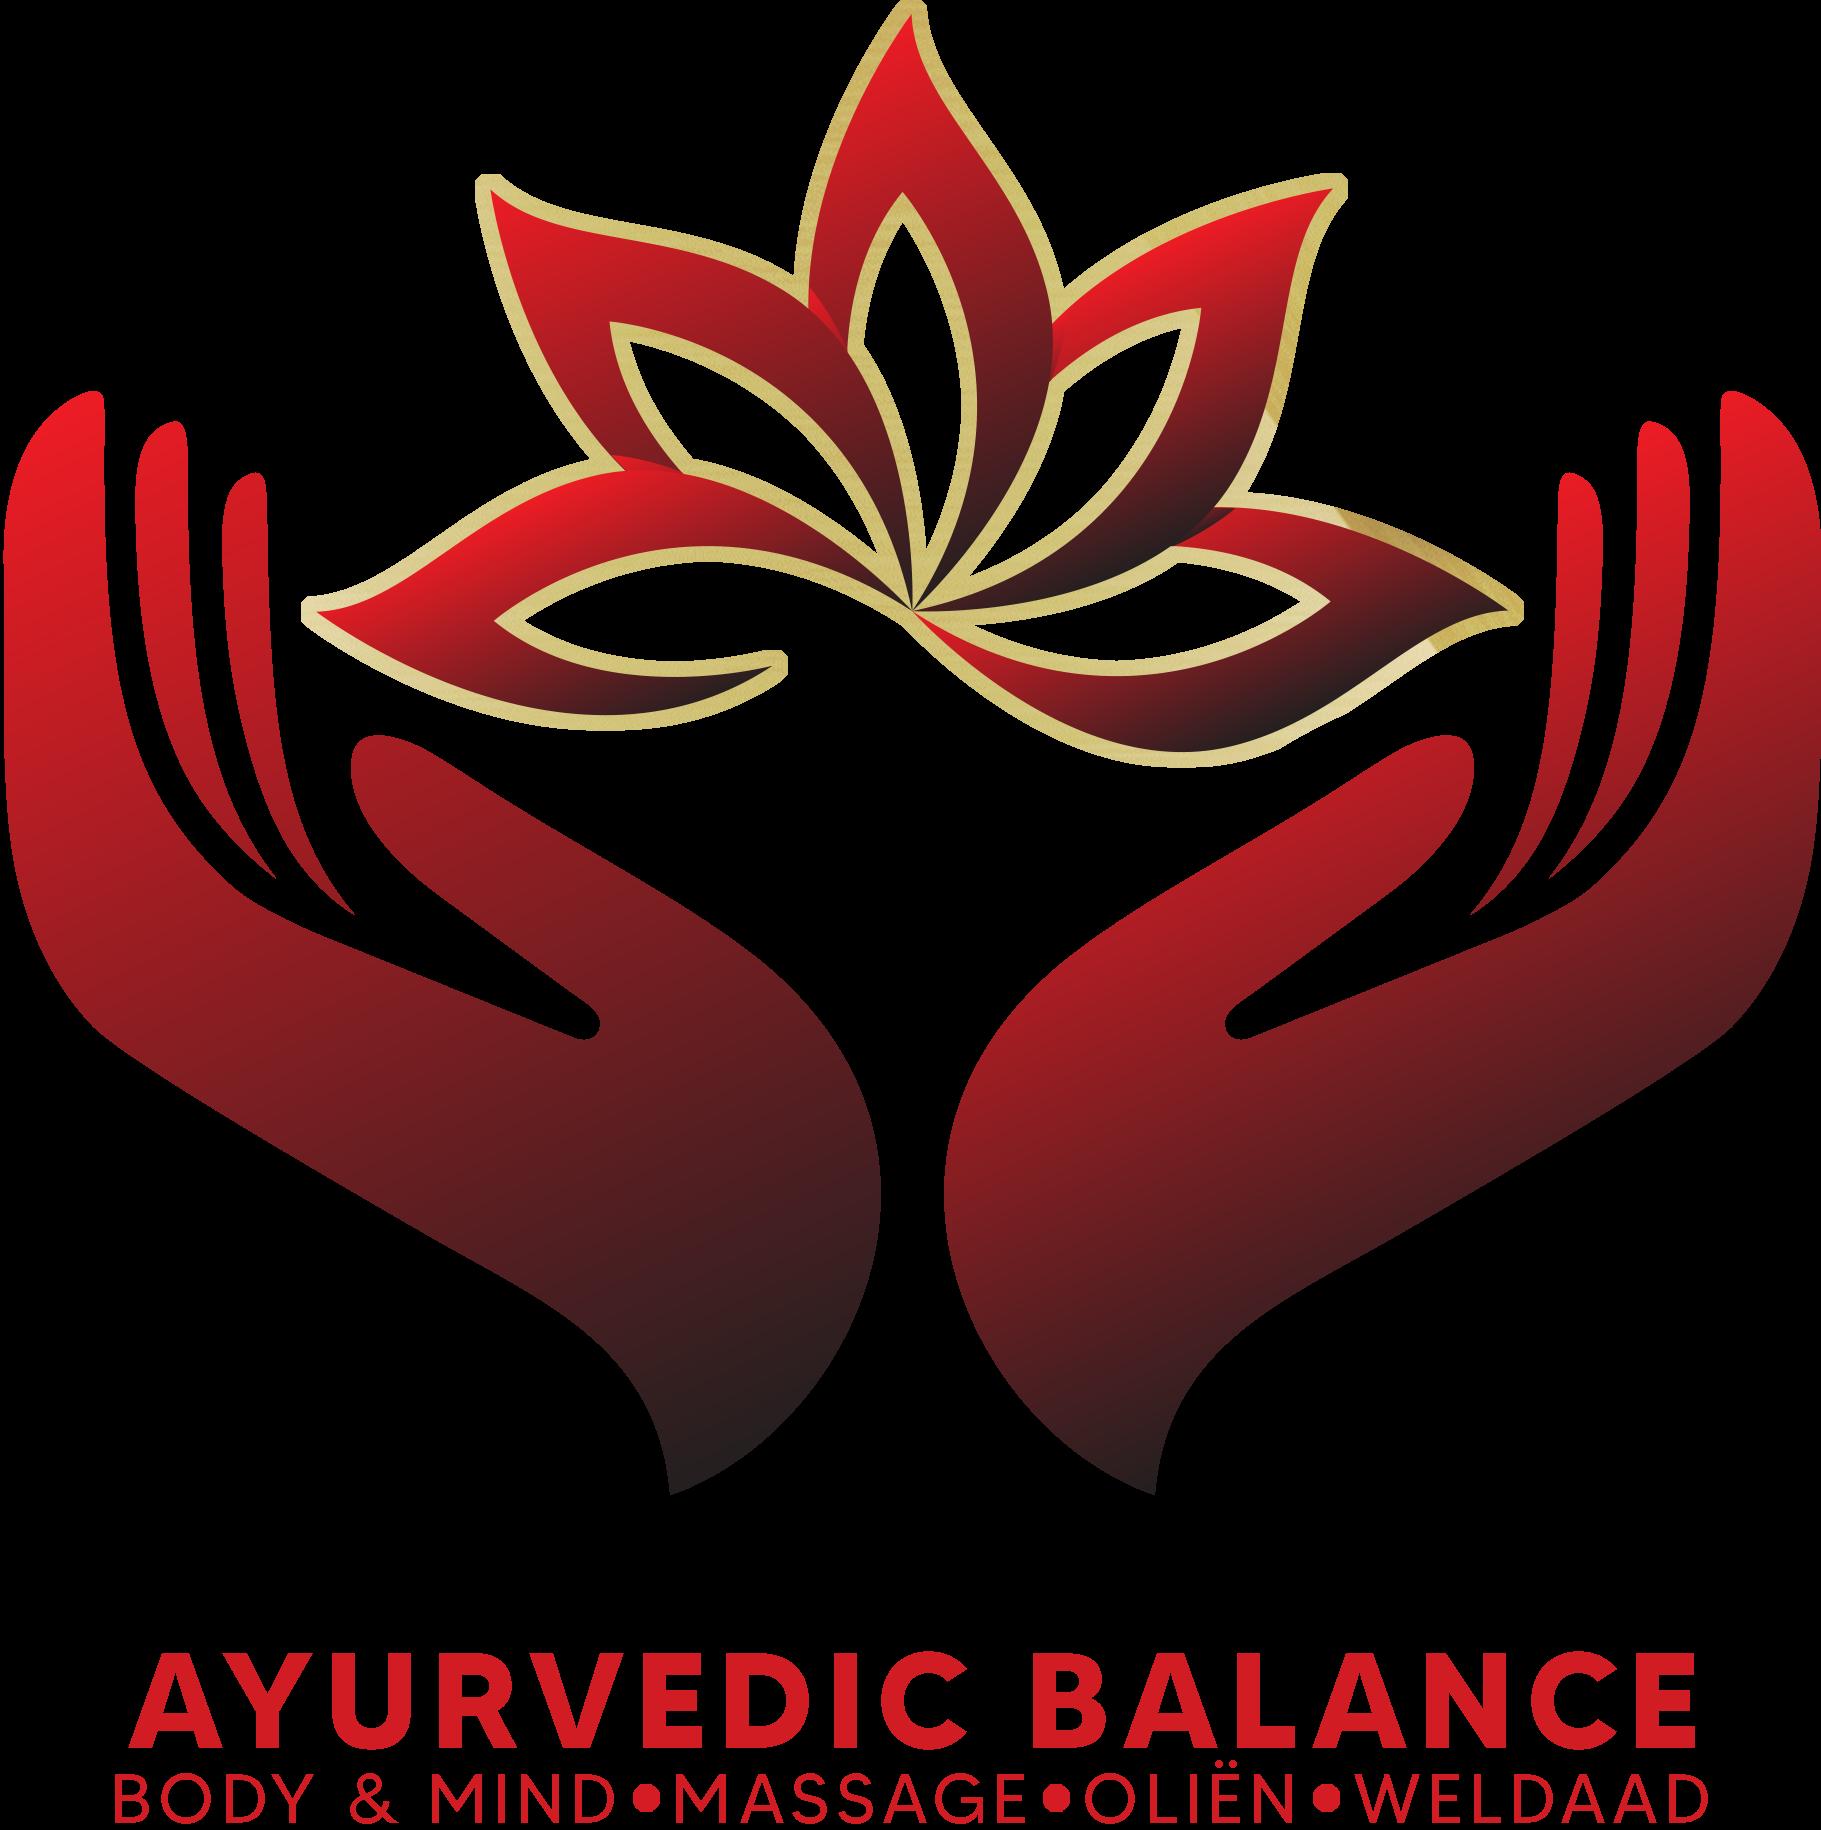 Ayurvedic Balance